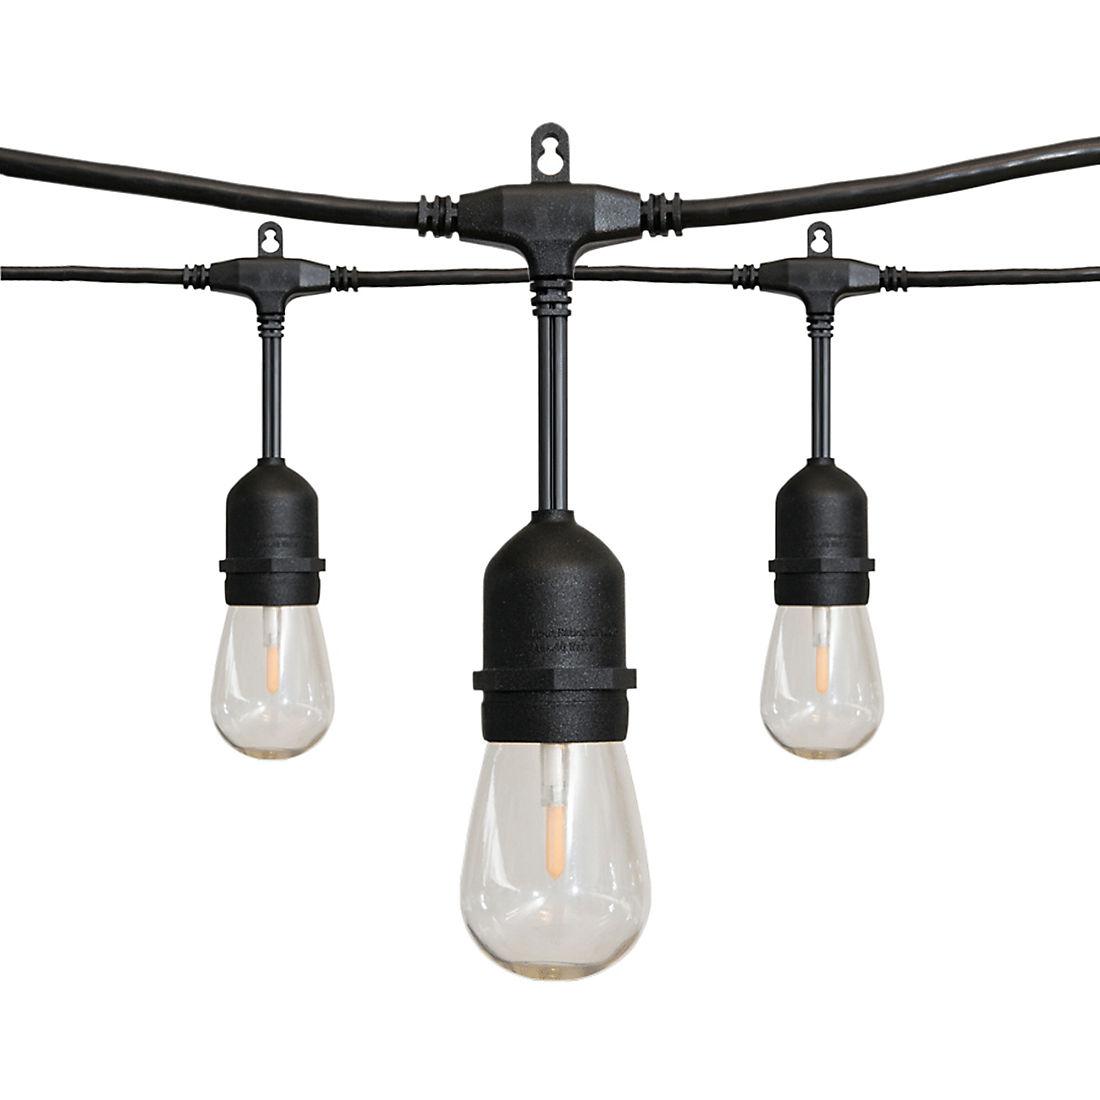 Alpan 36' Edison-Style LED String Lights - Black